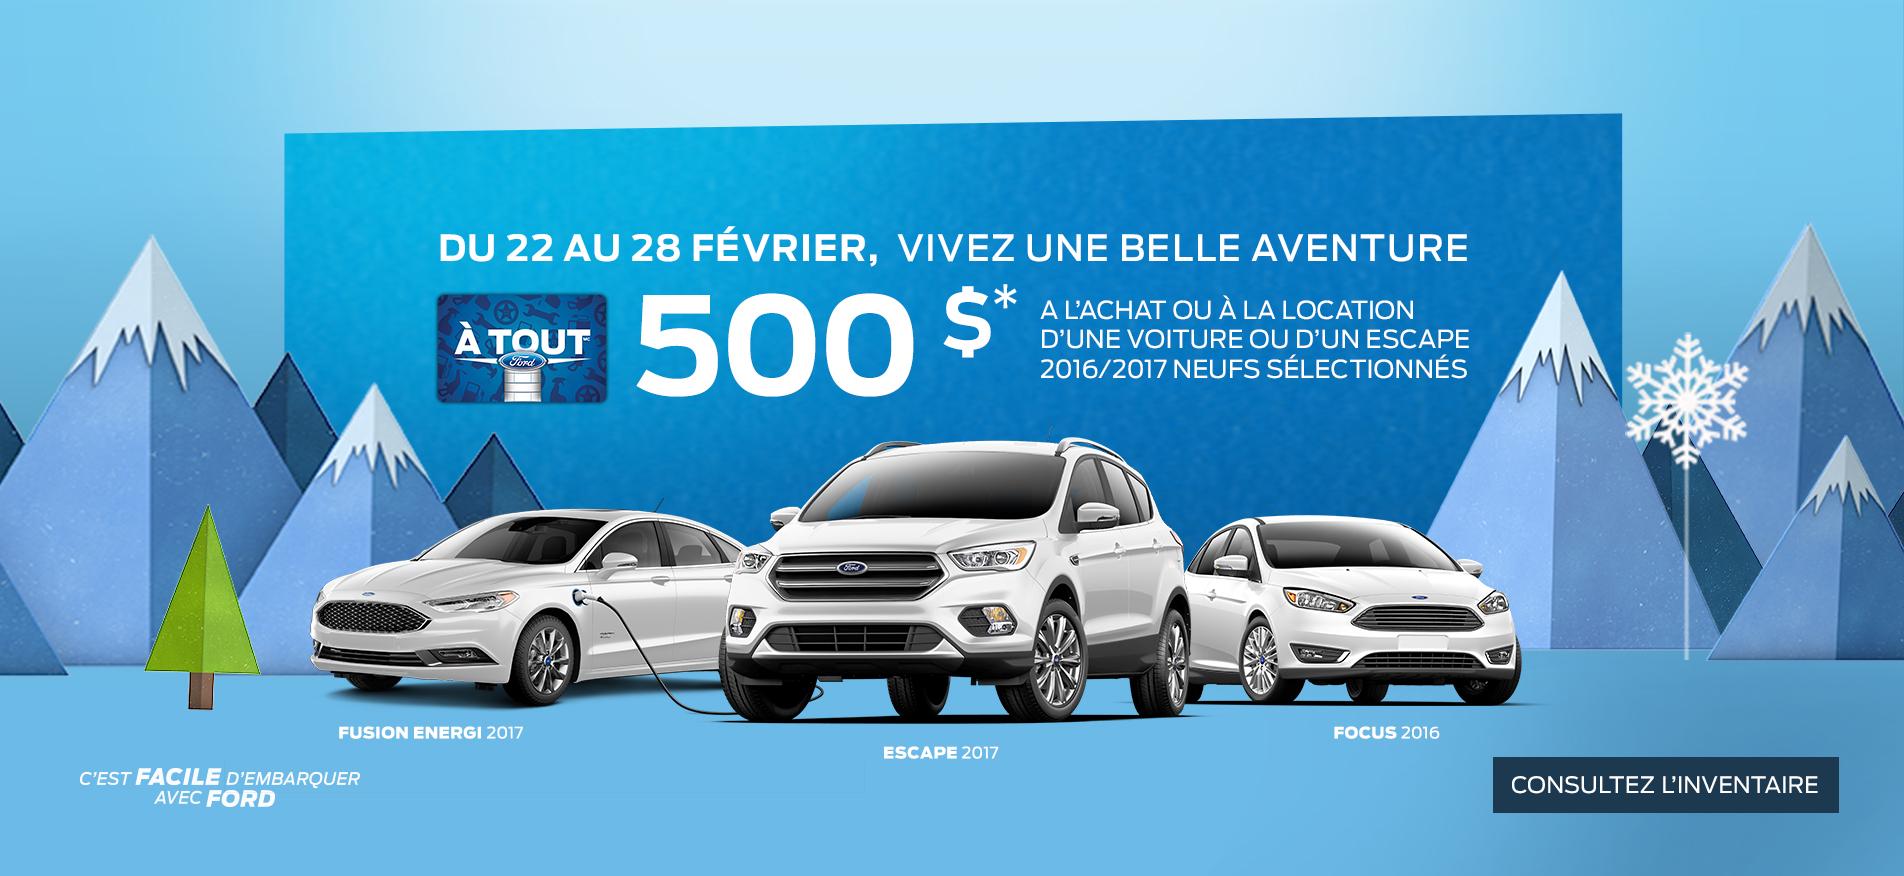 Promo FR 500